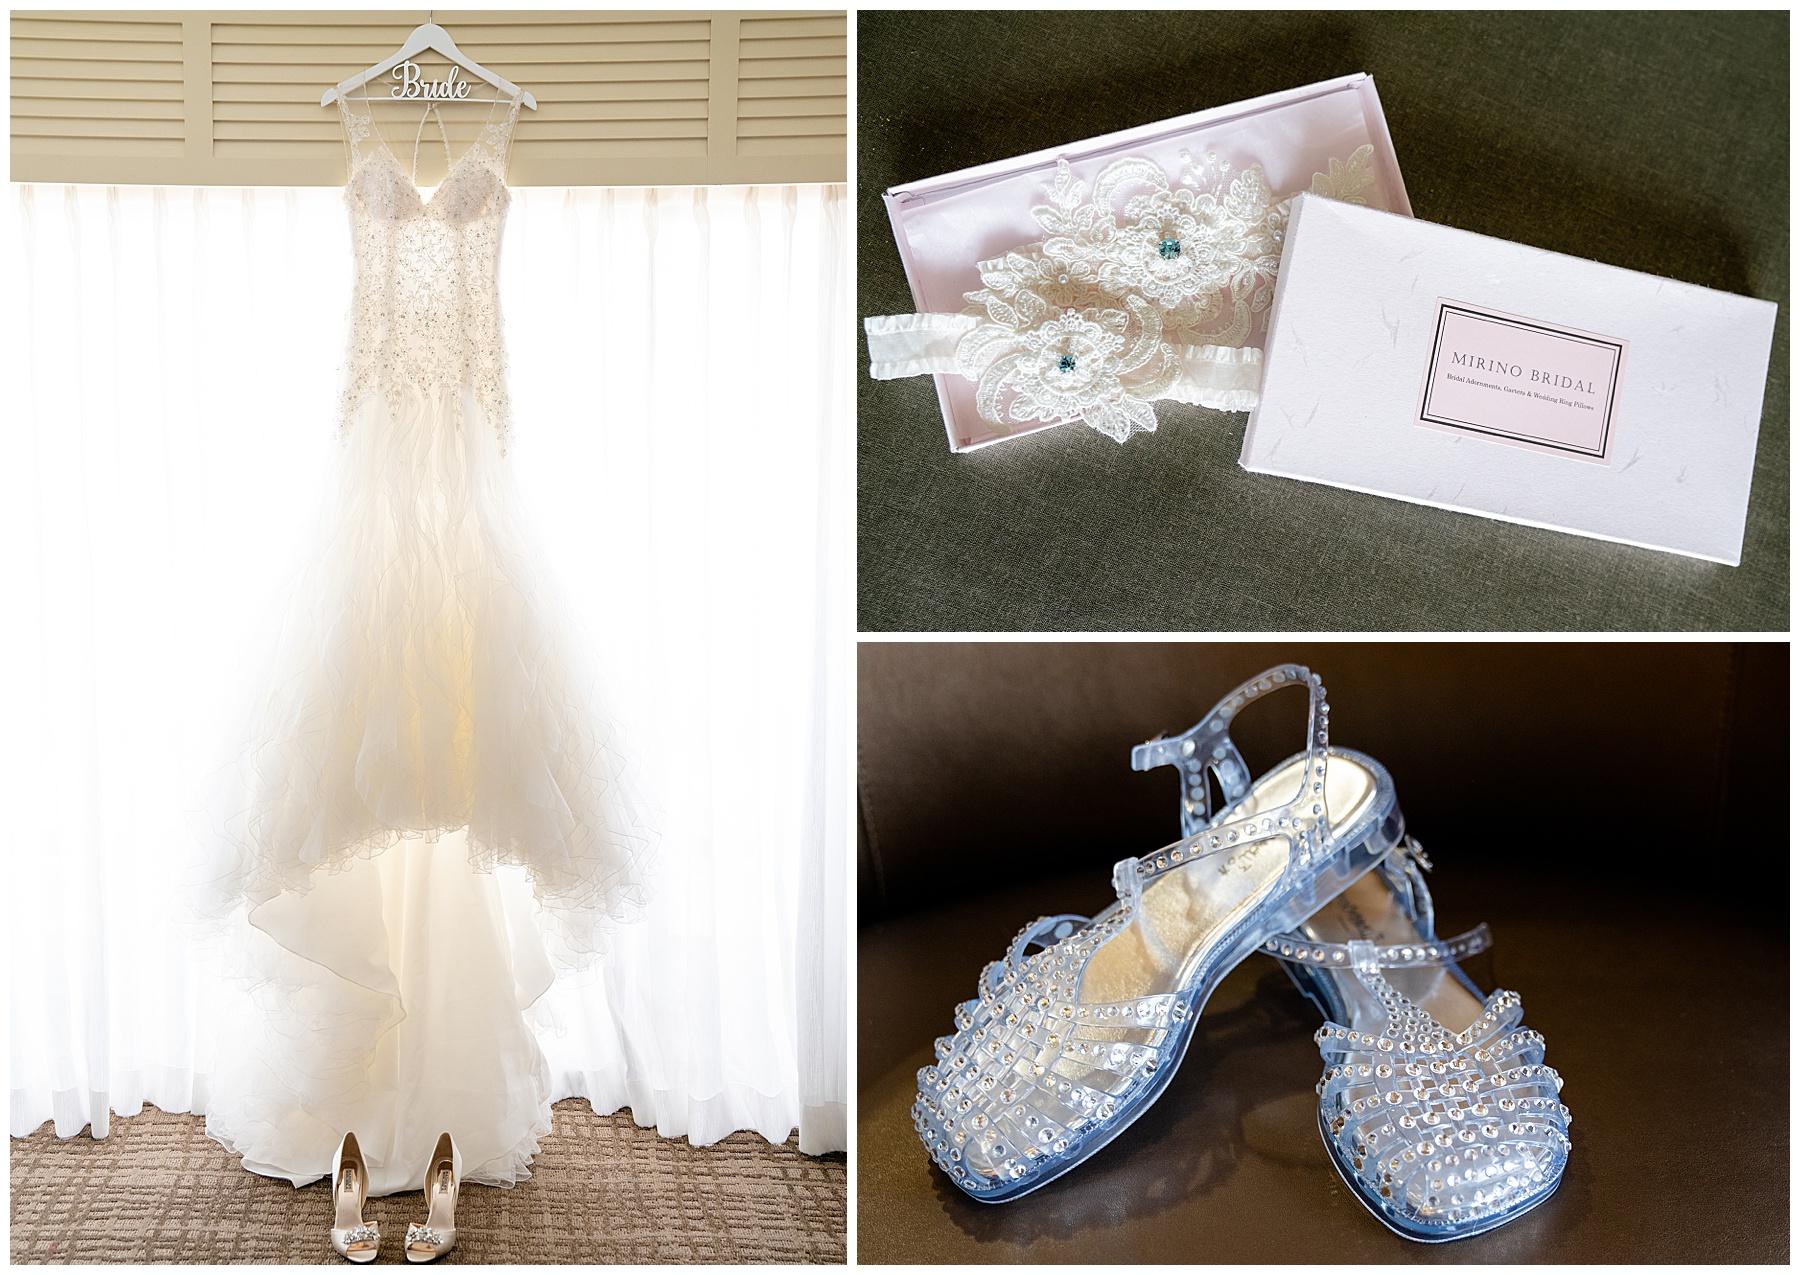 marriott marina del rey wedding details